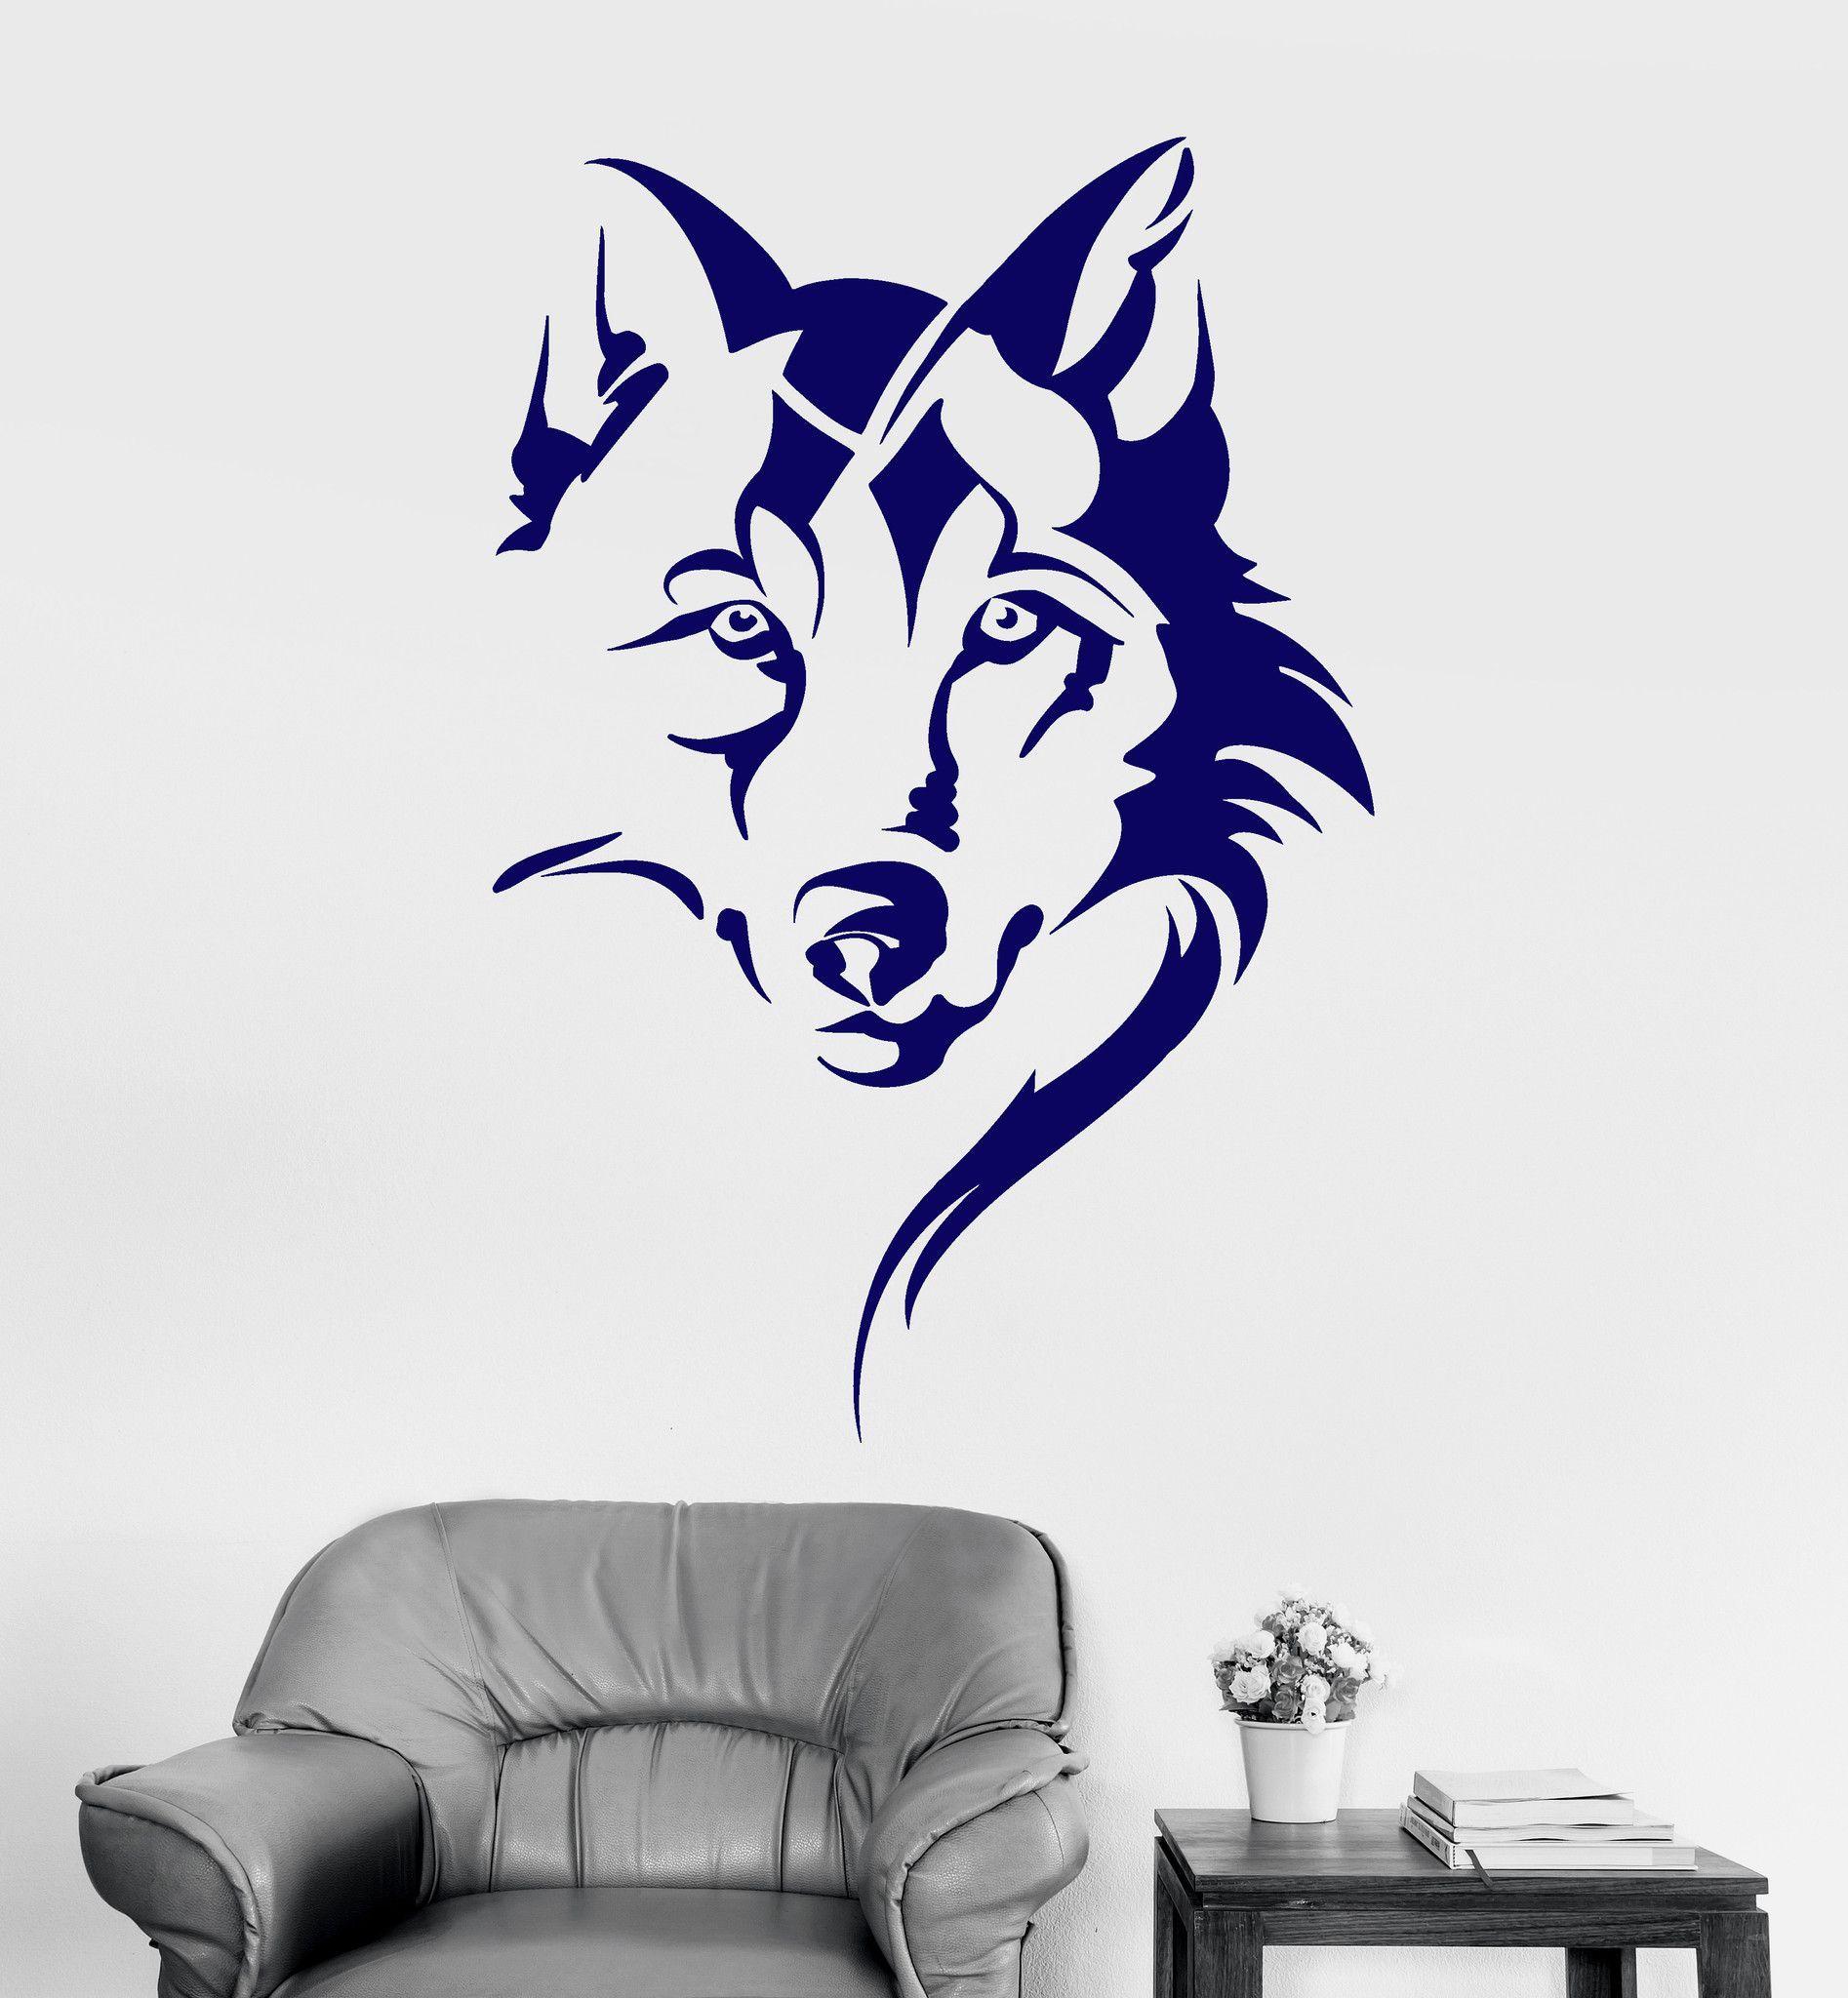 Vinyl Wall Decal Wolf Head Animal Tribal Art Room Decor